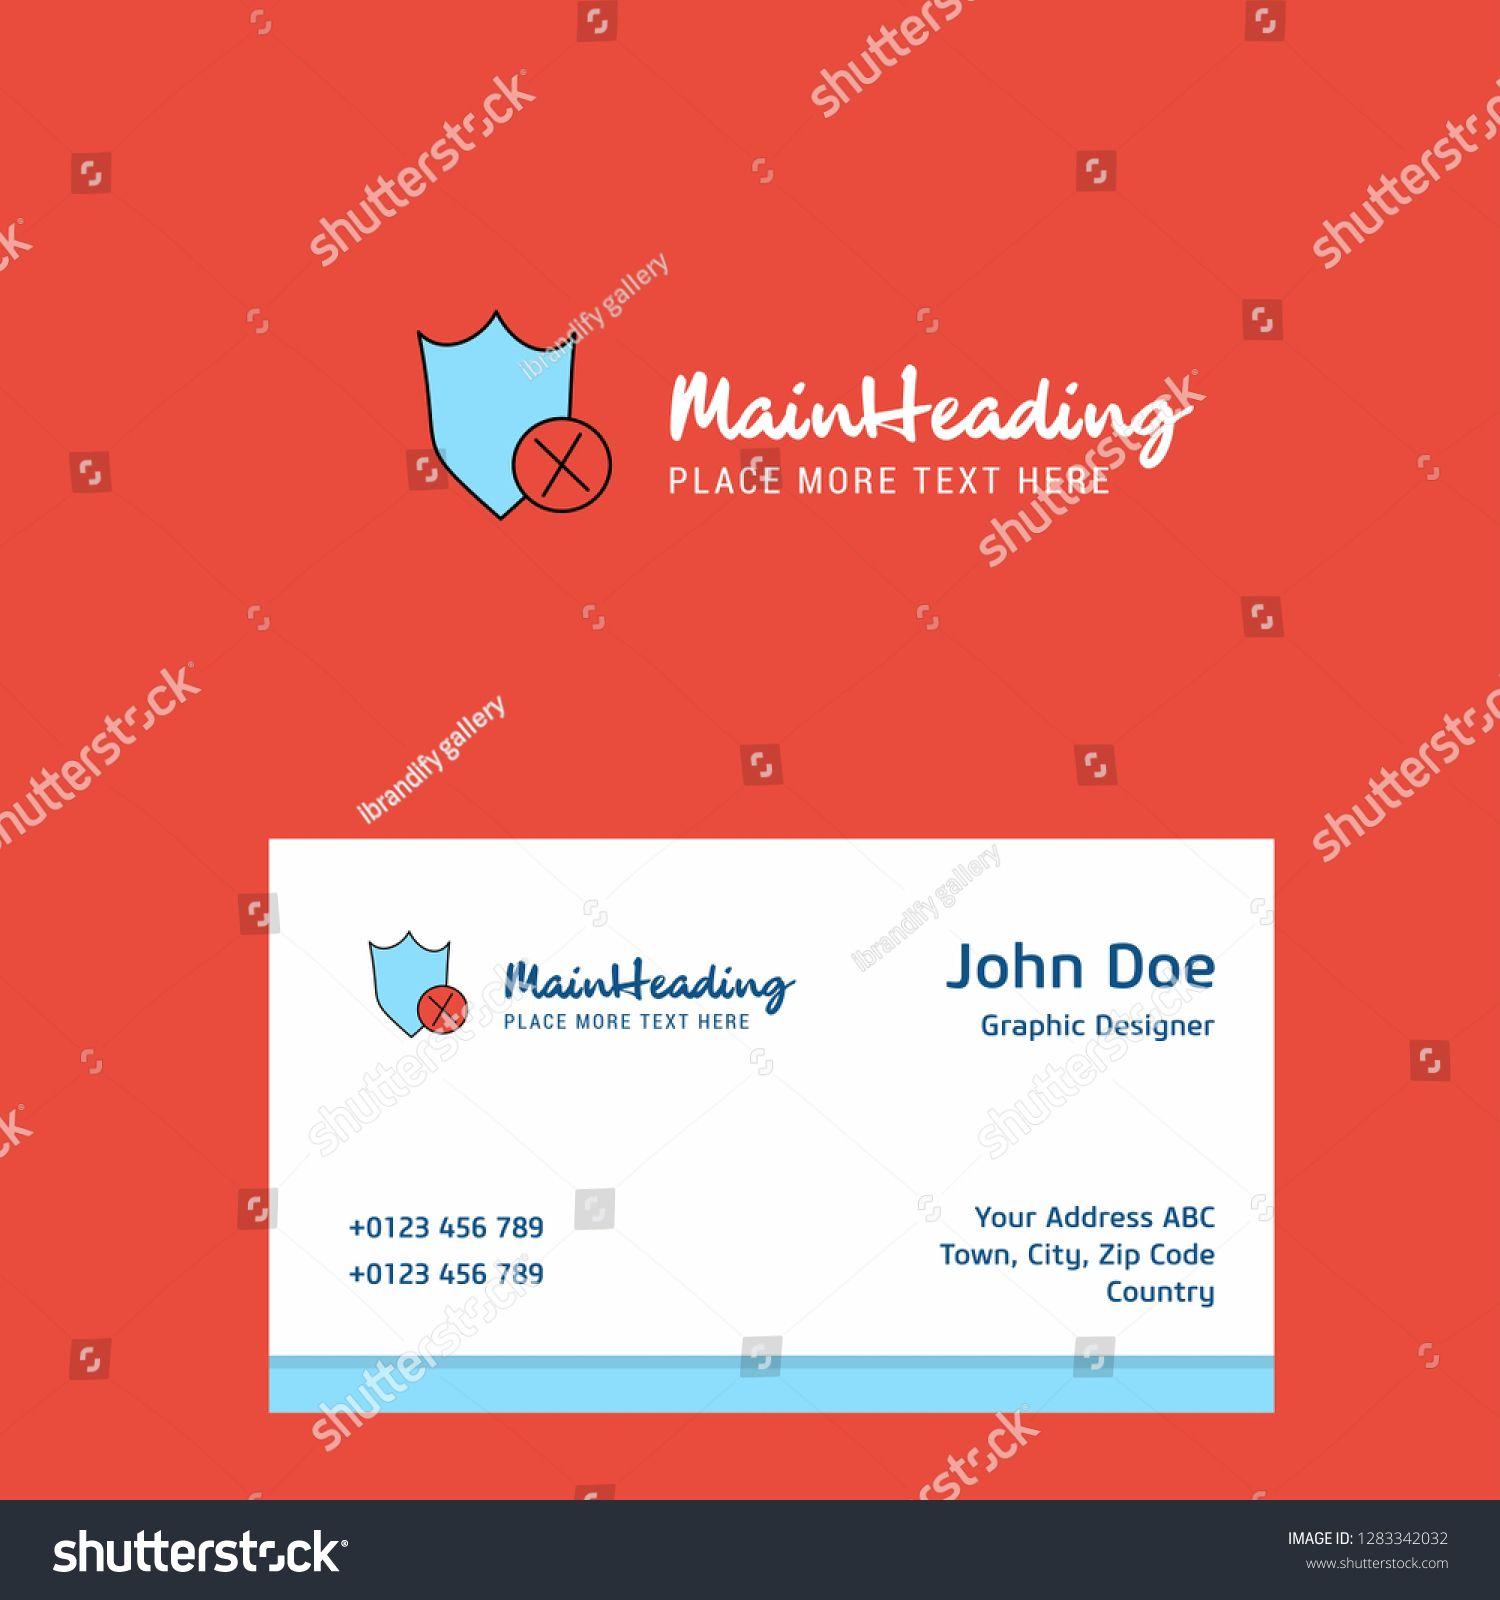 Shield Logo Design Business Card Template In 2020 Business Card Design Business Card Template Design Modern Business Cards Design